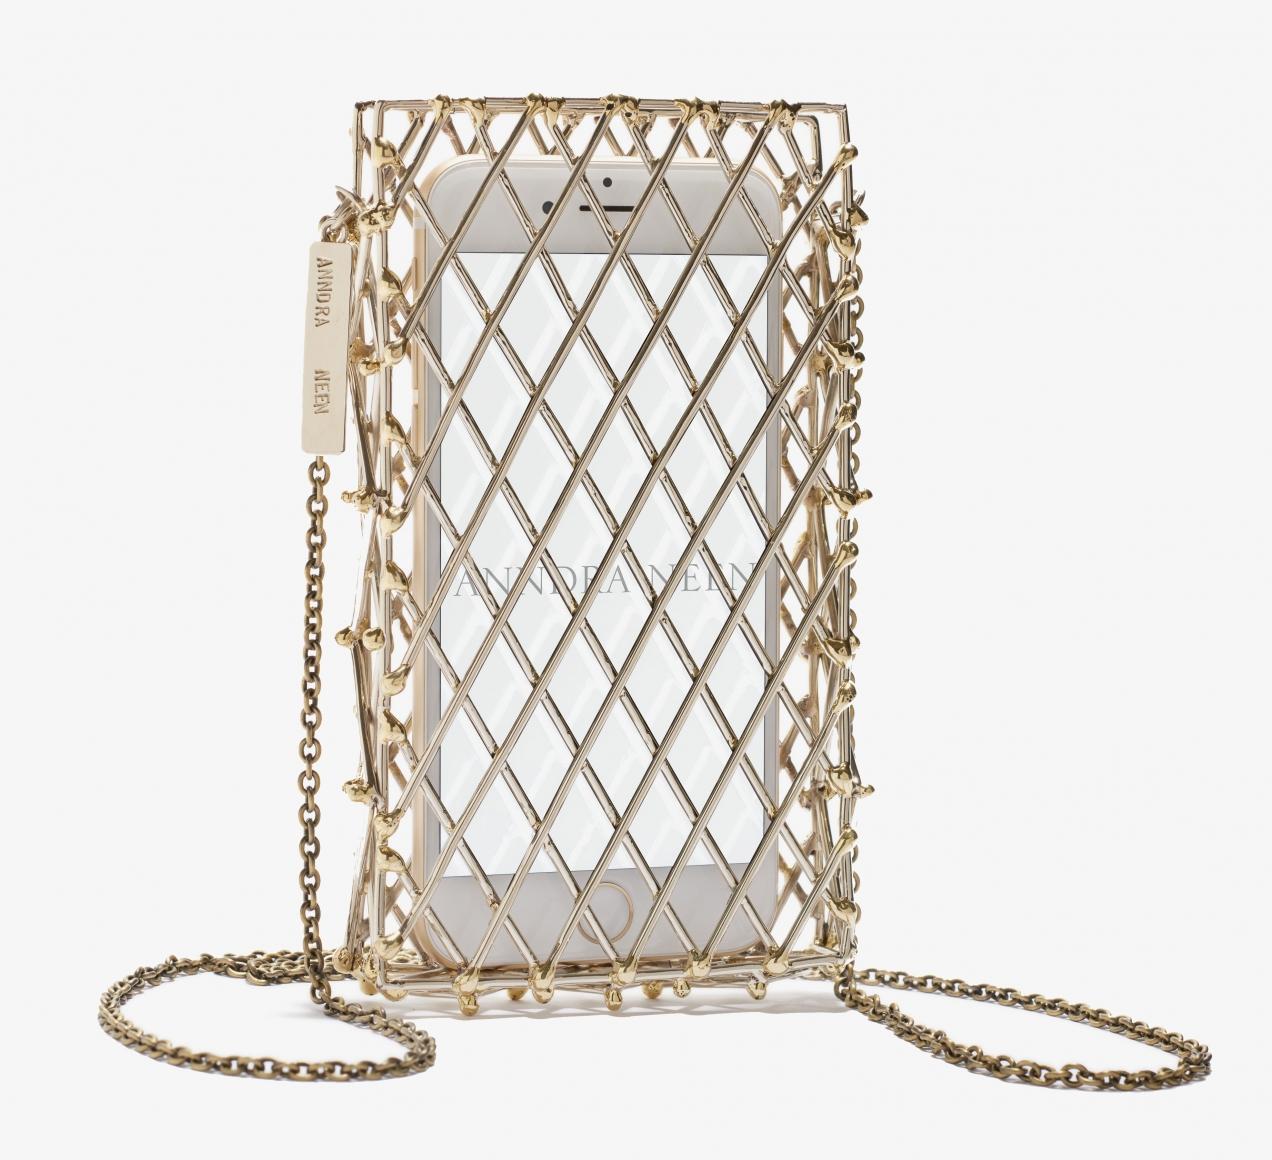 Cage iPhone Case